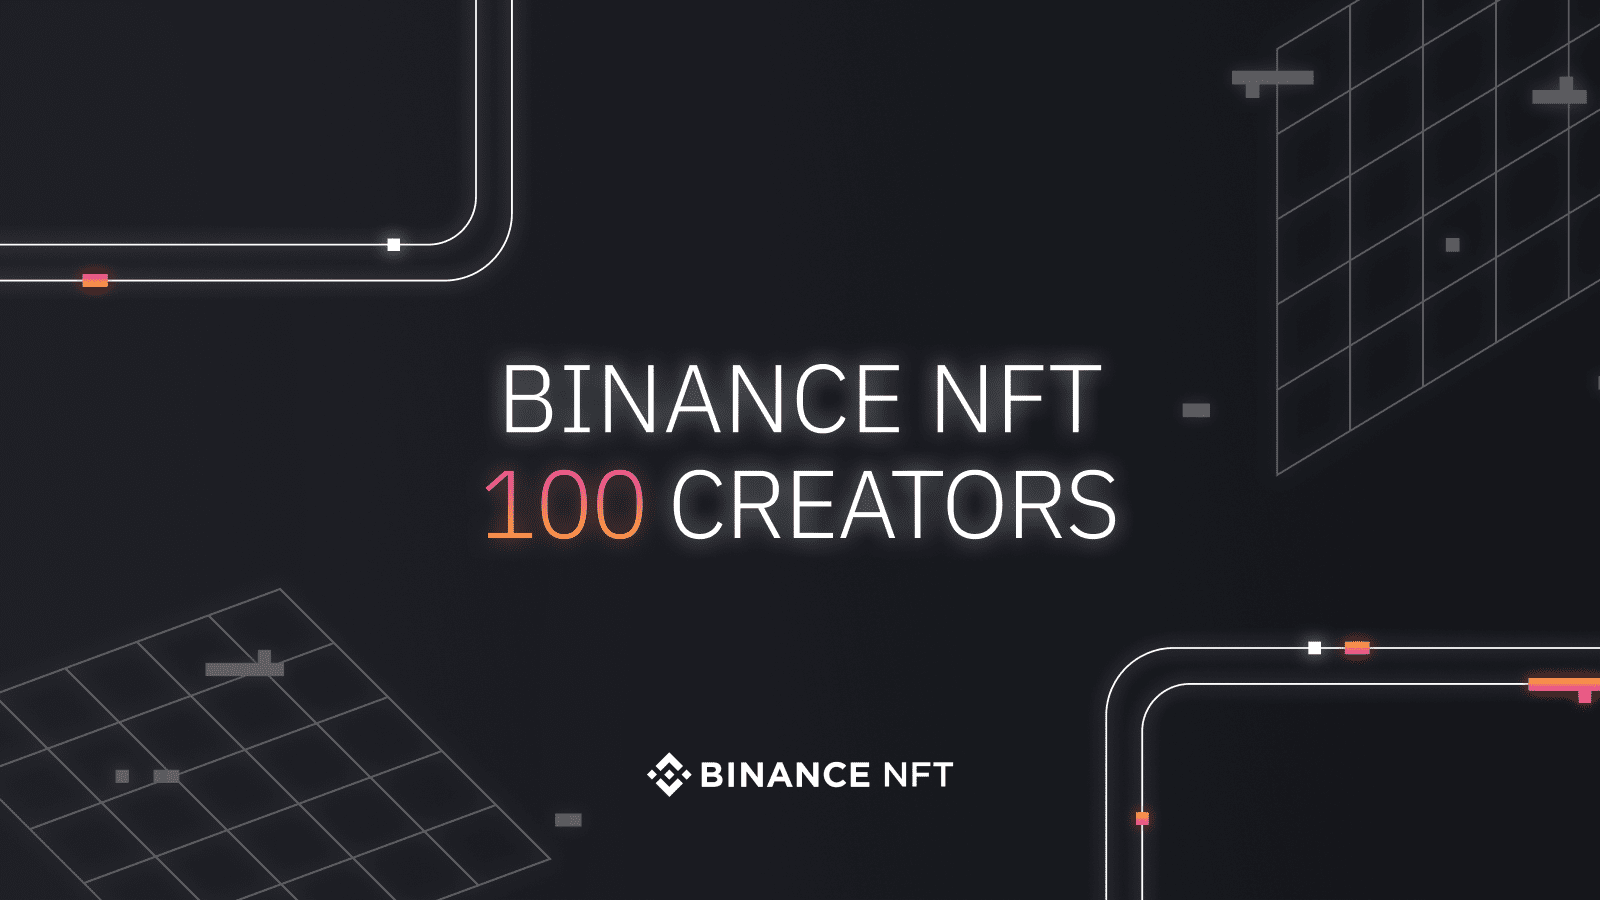 Binance NFT Creators